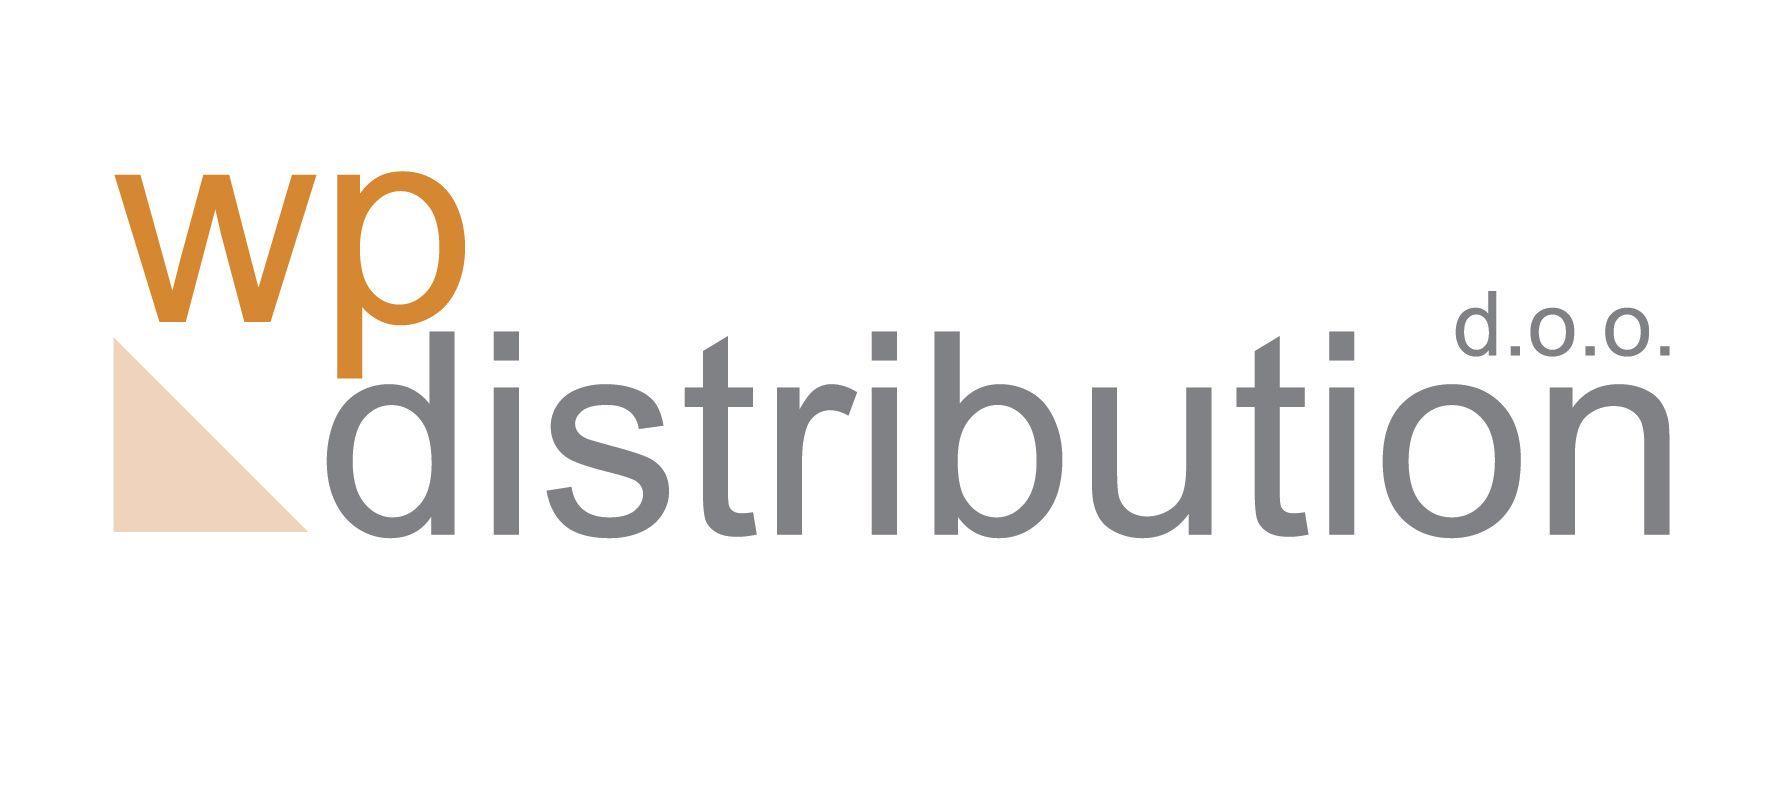 WP Distribution doo